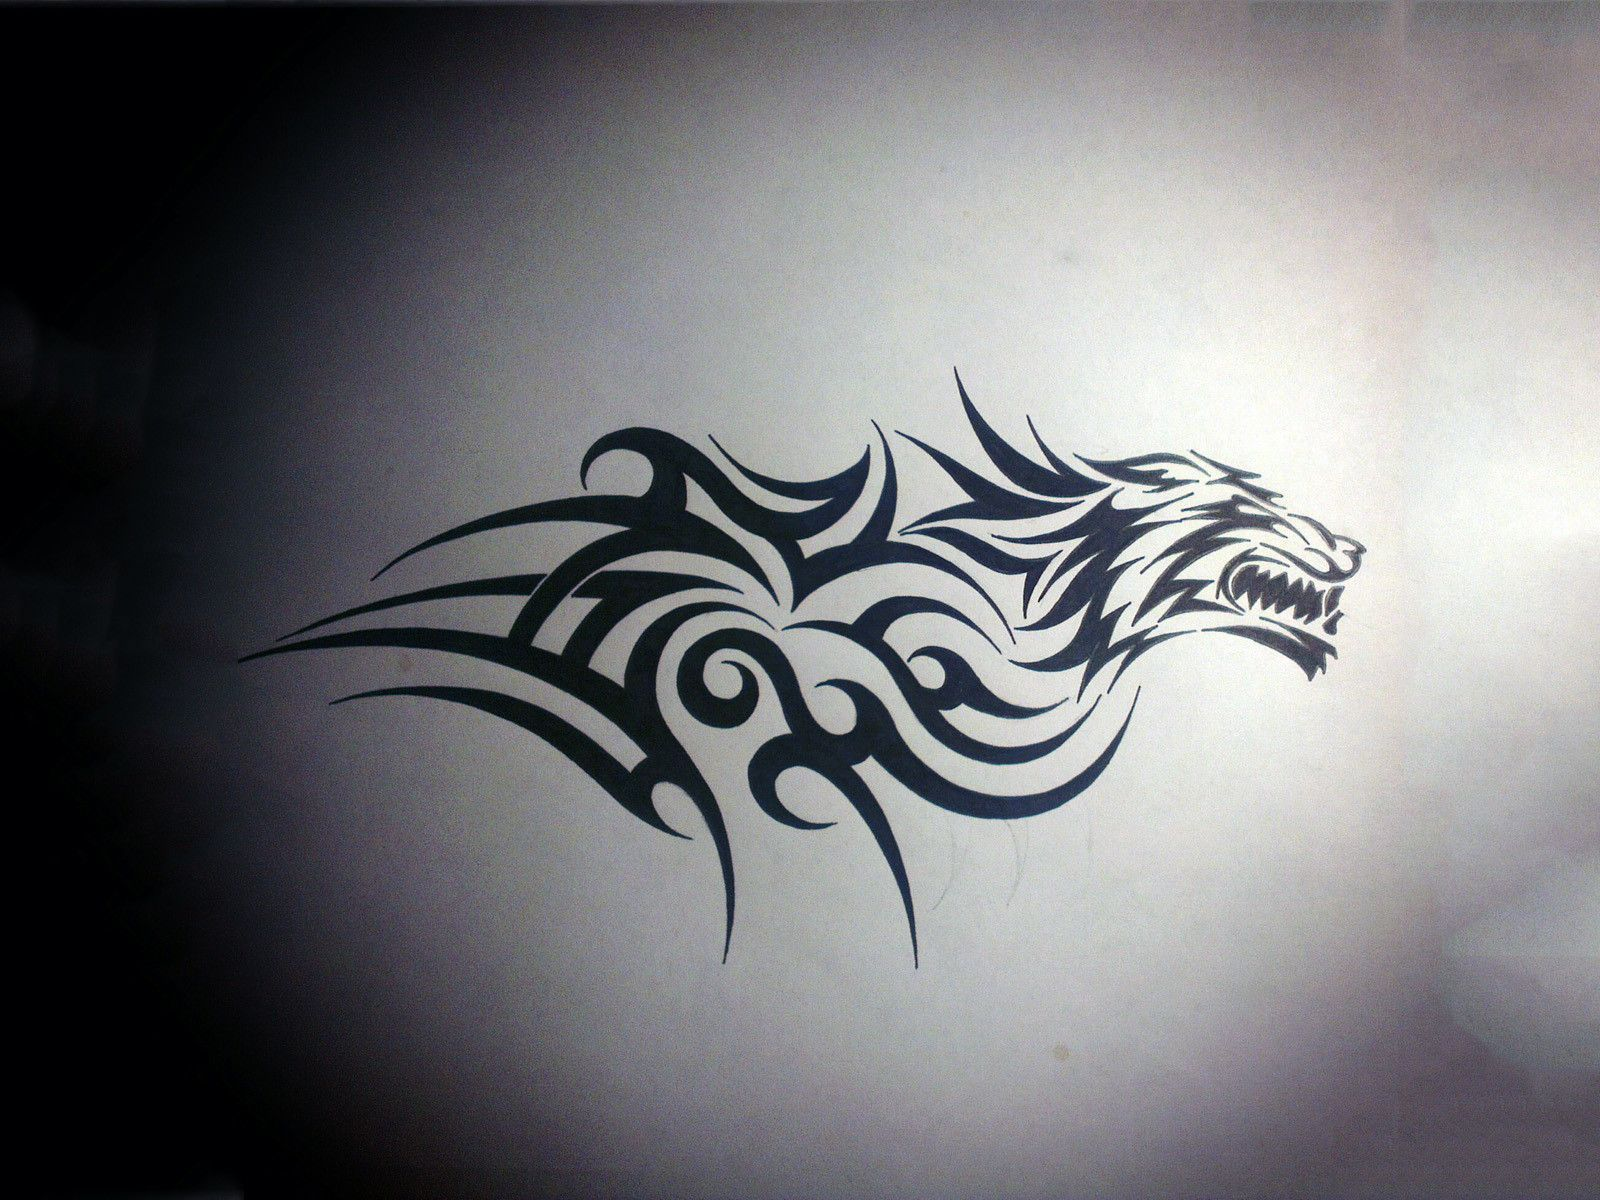 Tiger Tribal Tattoo Design Wallpaper Designs